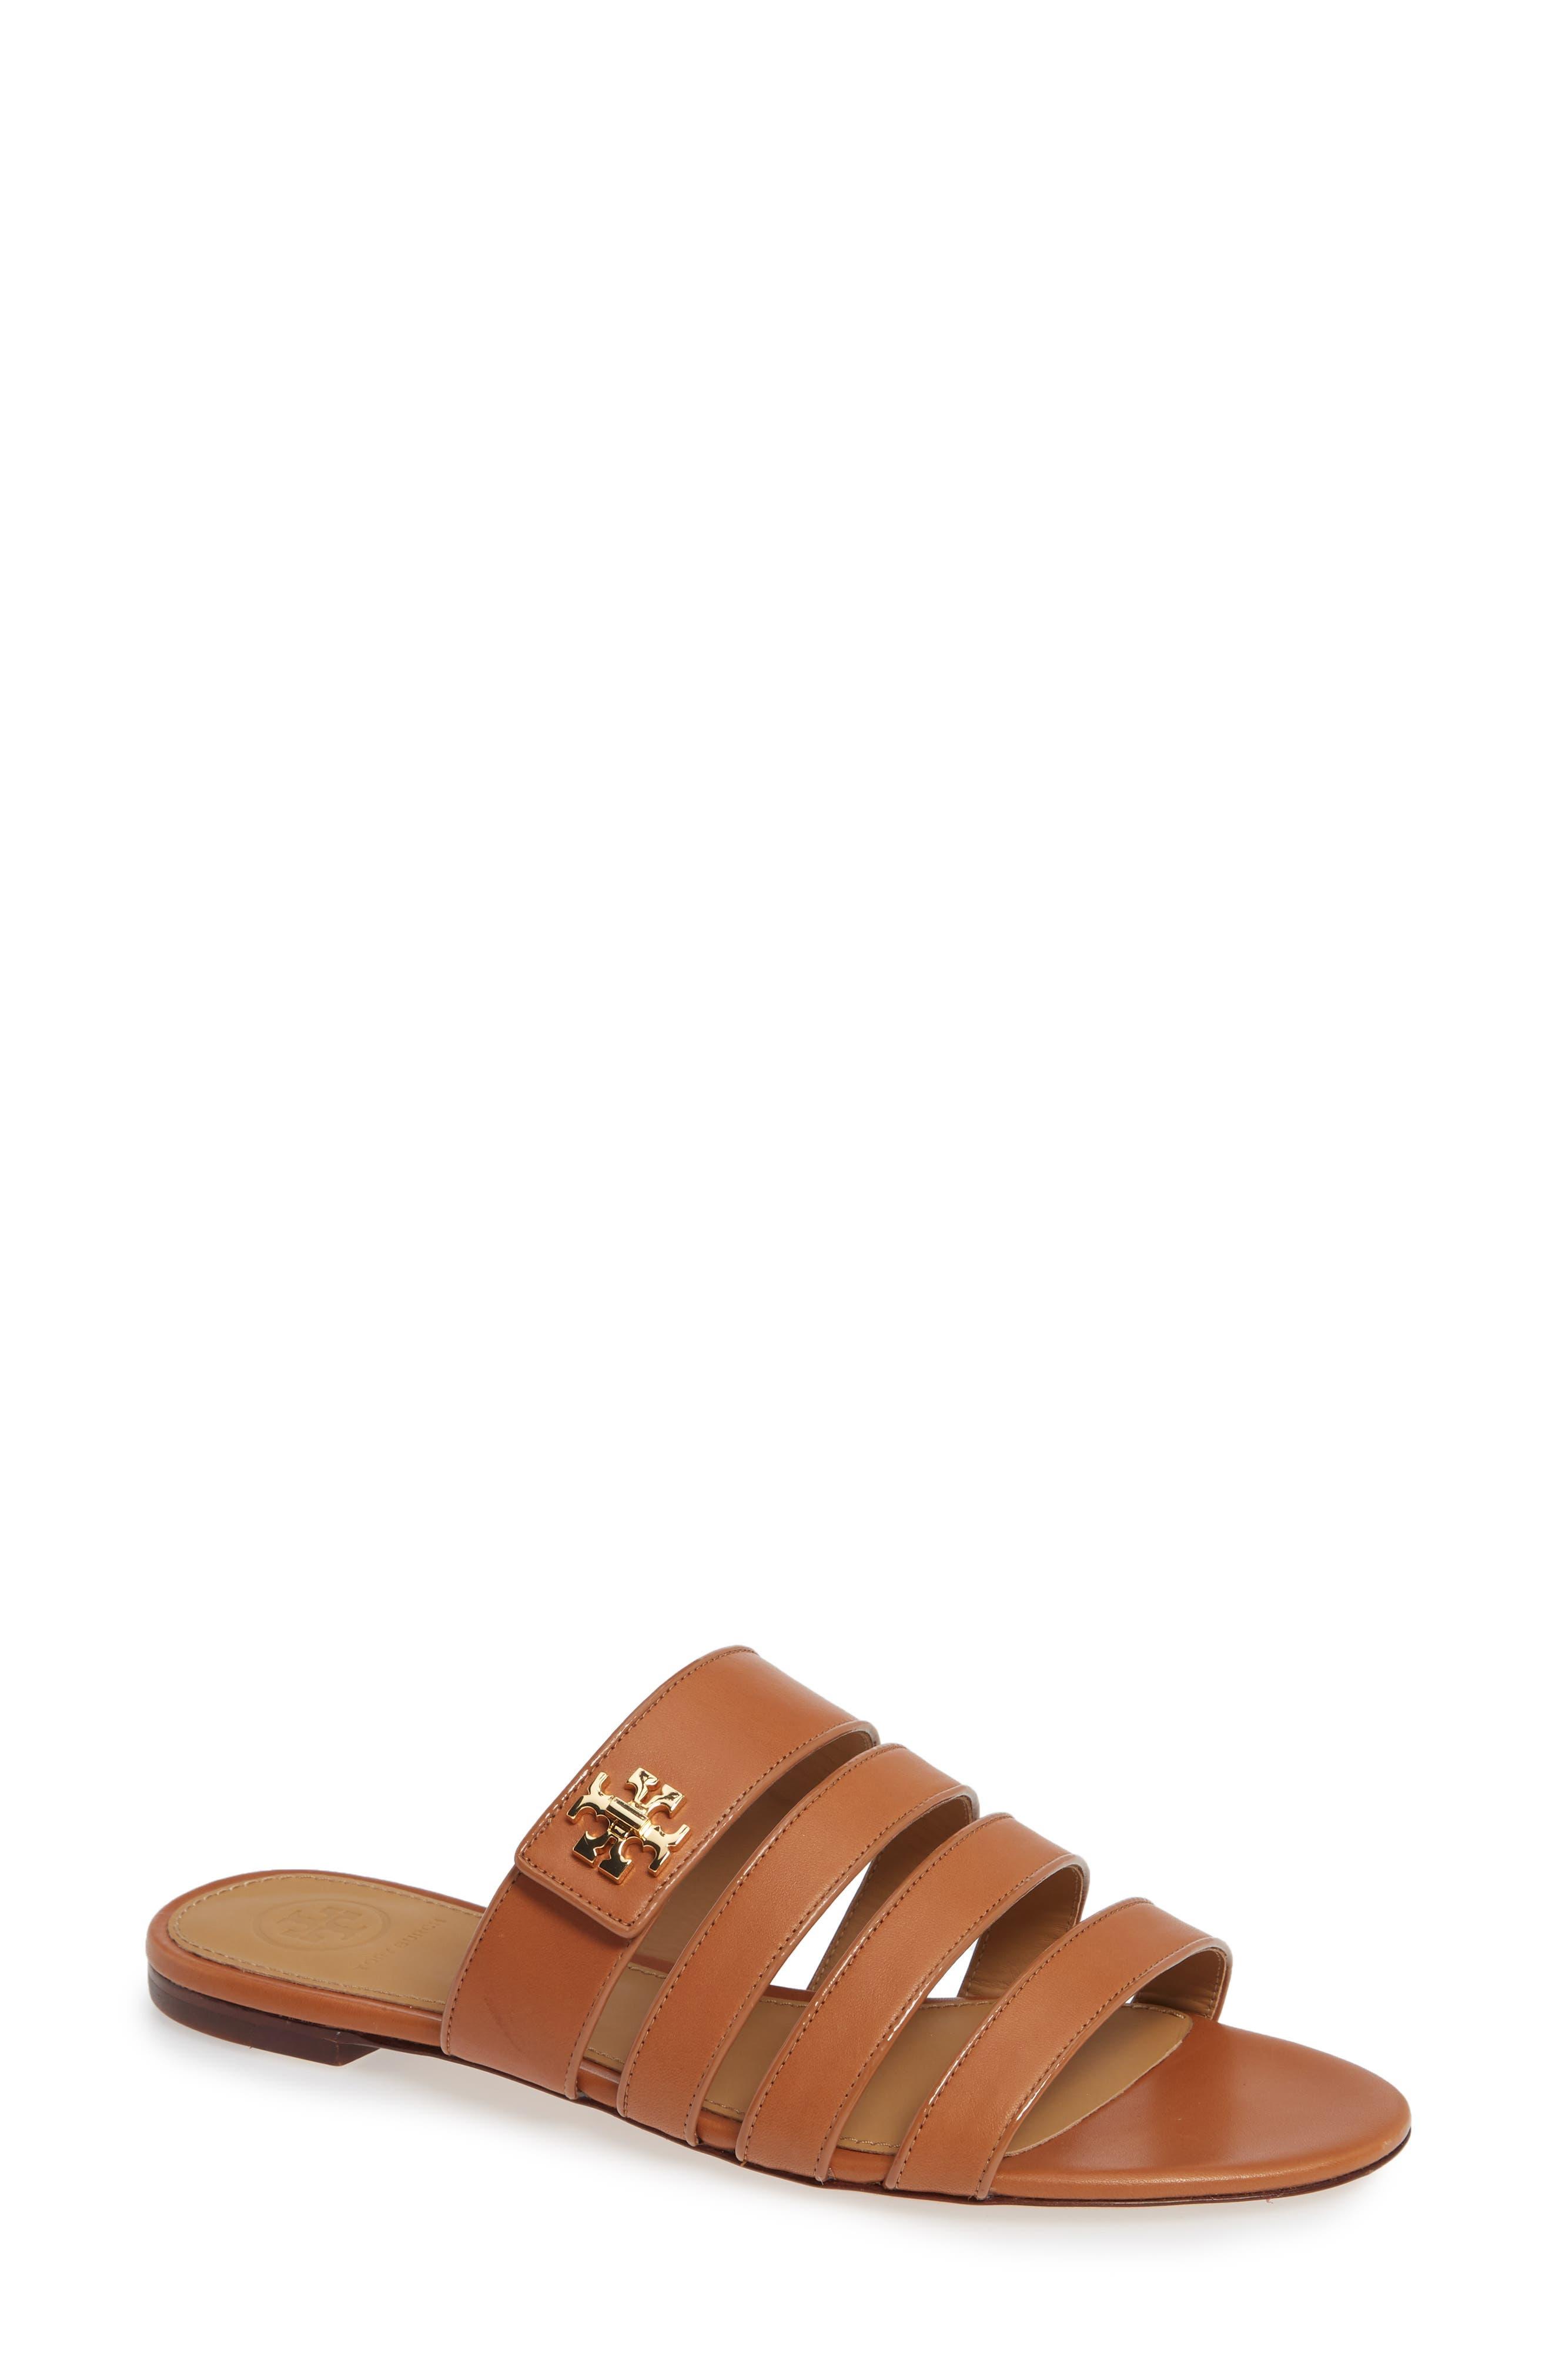 Tory Burch Kira Strappy Slide Sandal, Brown